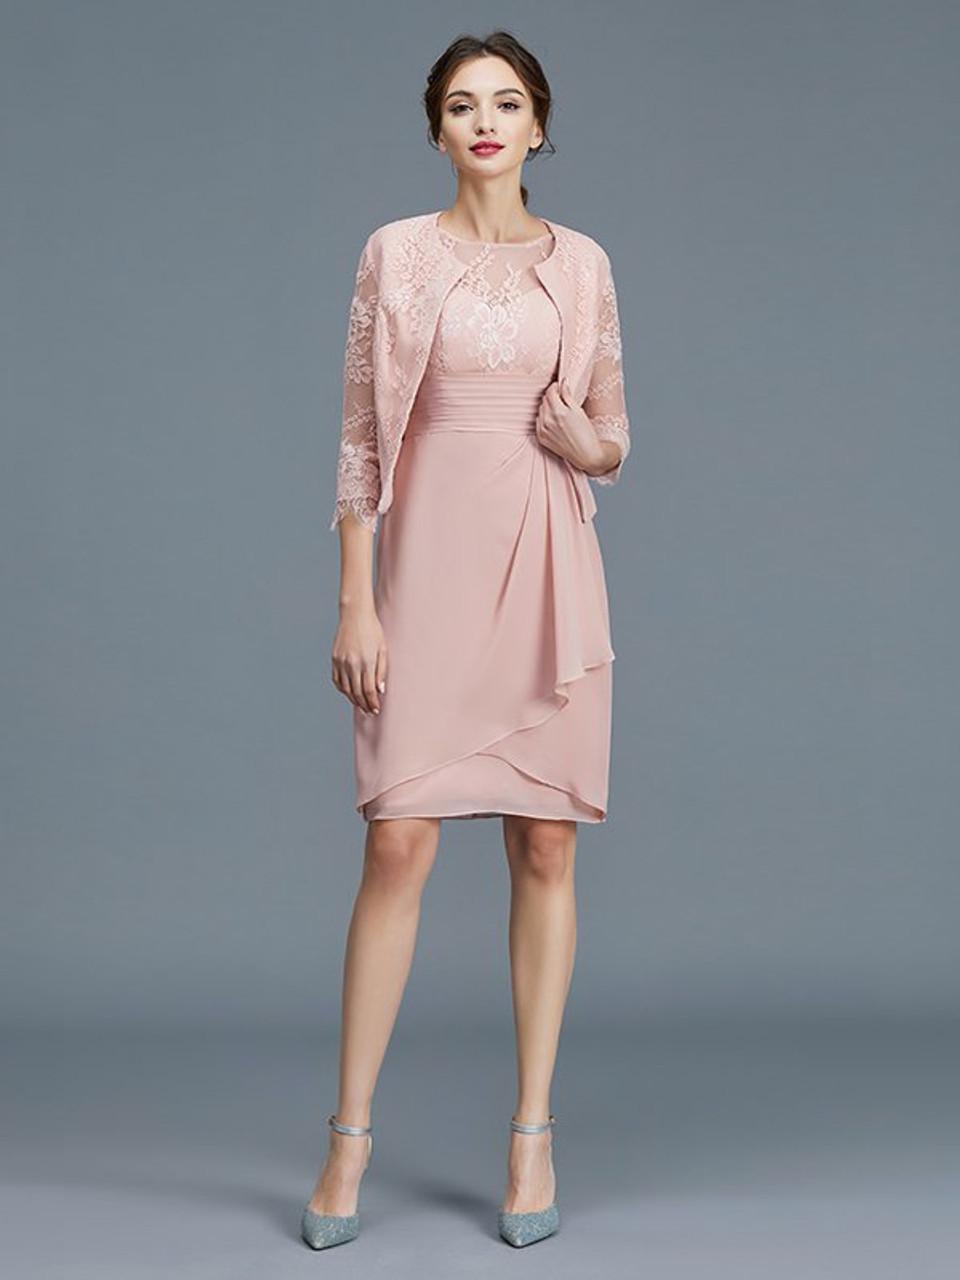 Pink Mother of Bride Dress